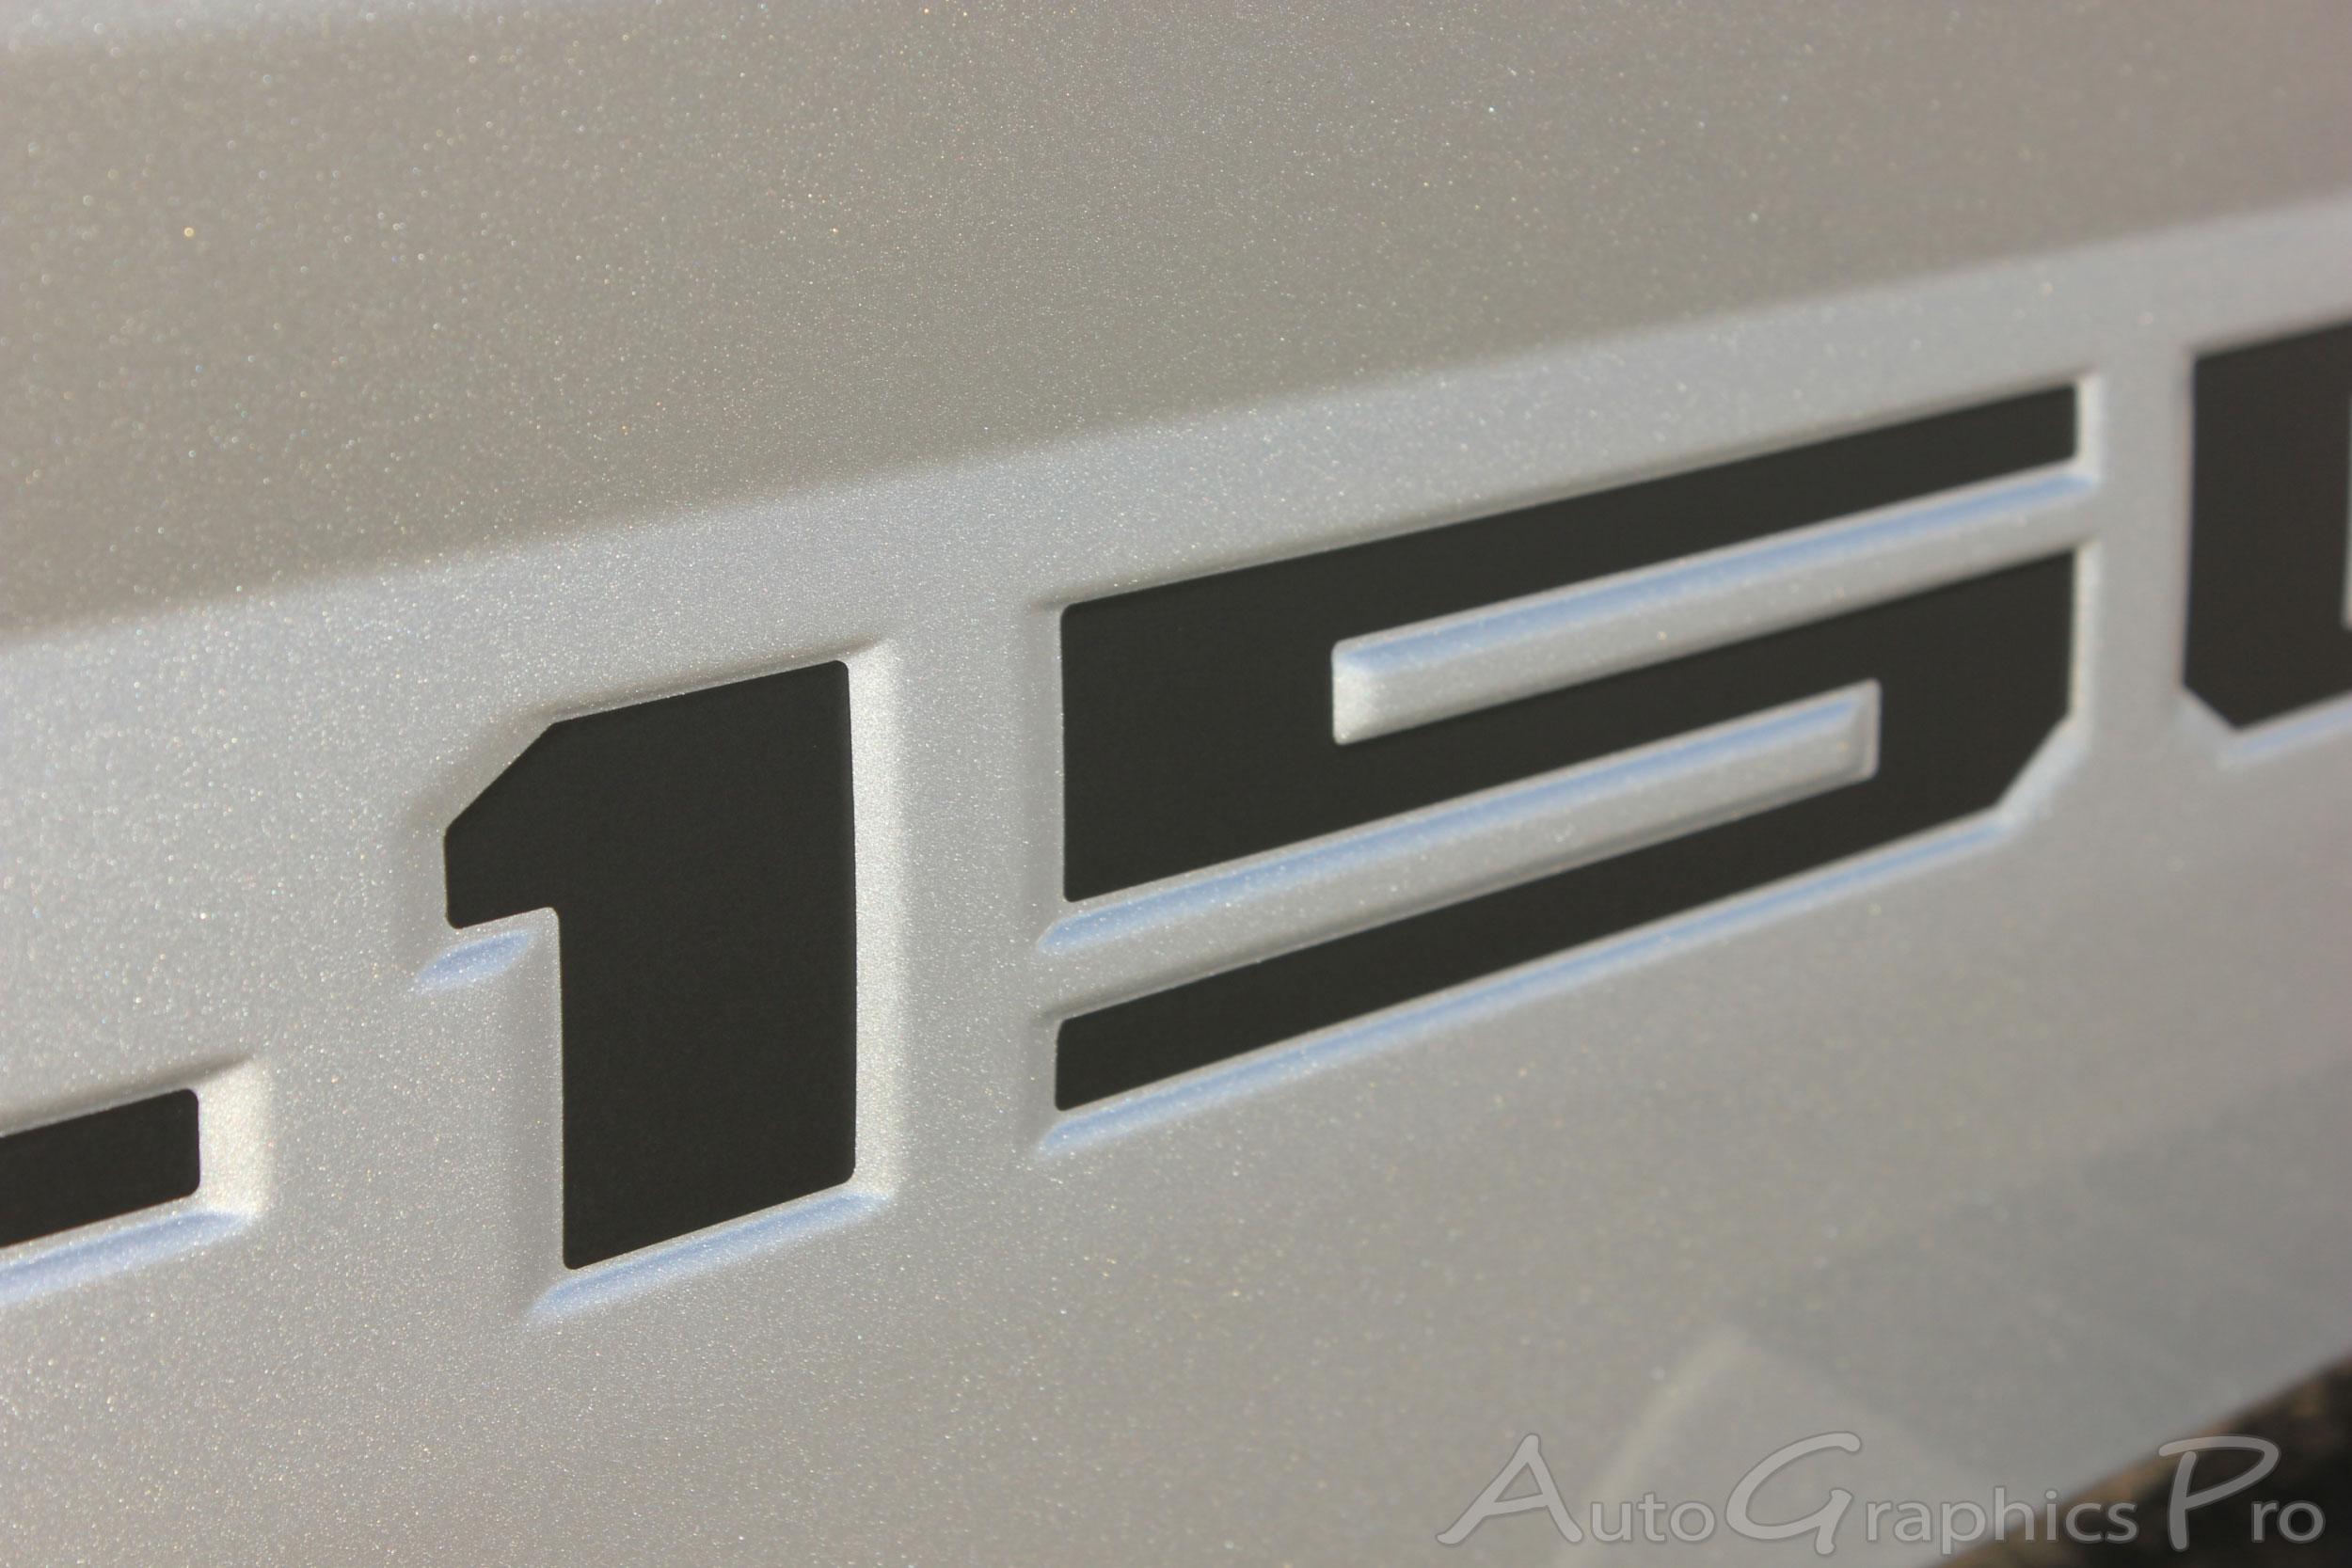 2018 2019 Ford F 150 Tailgate Decals Speedway Text Inlays Vinyl